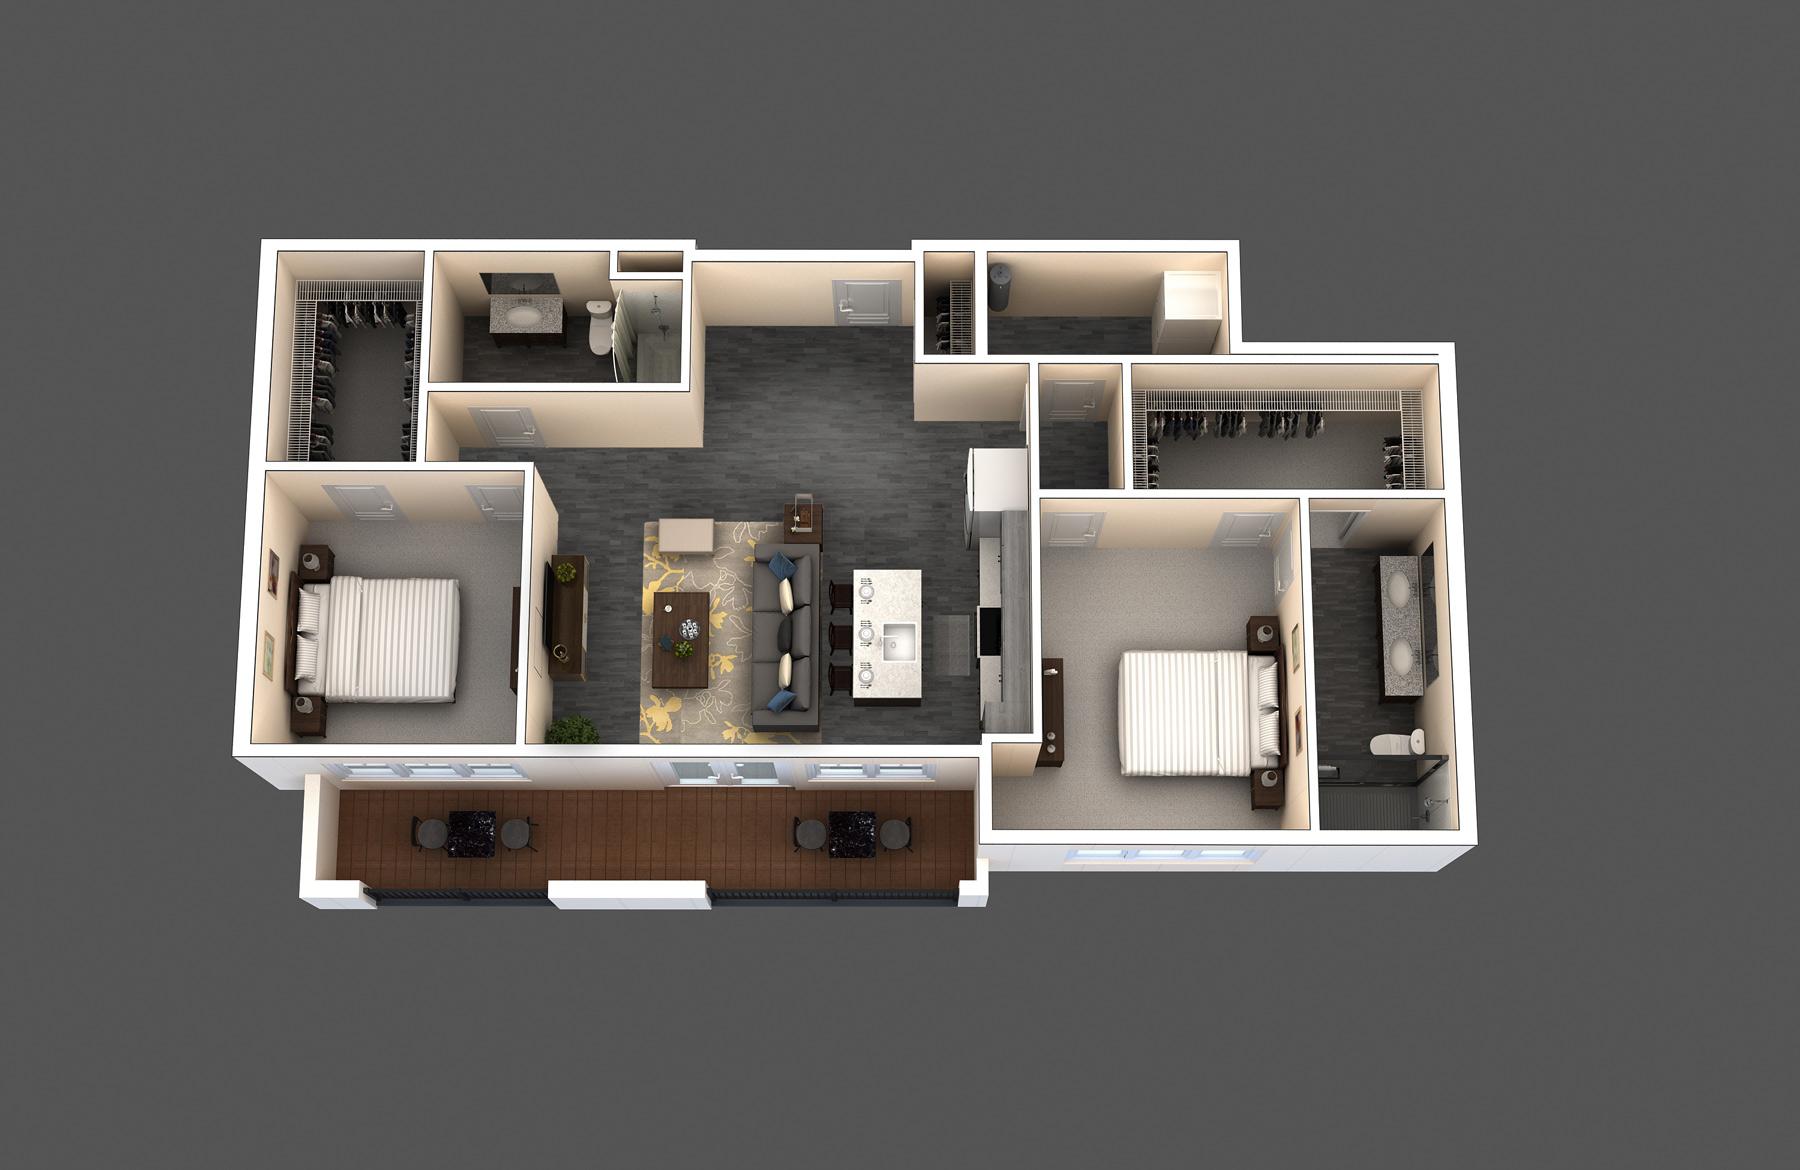 The Bristol floor plan